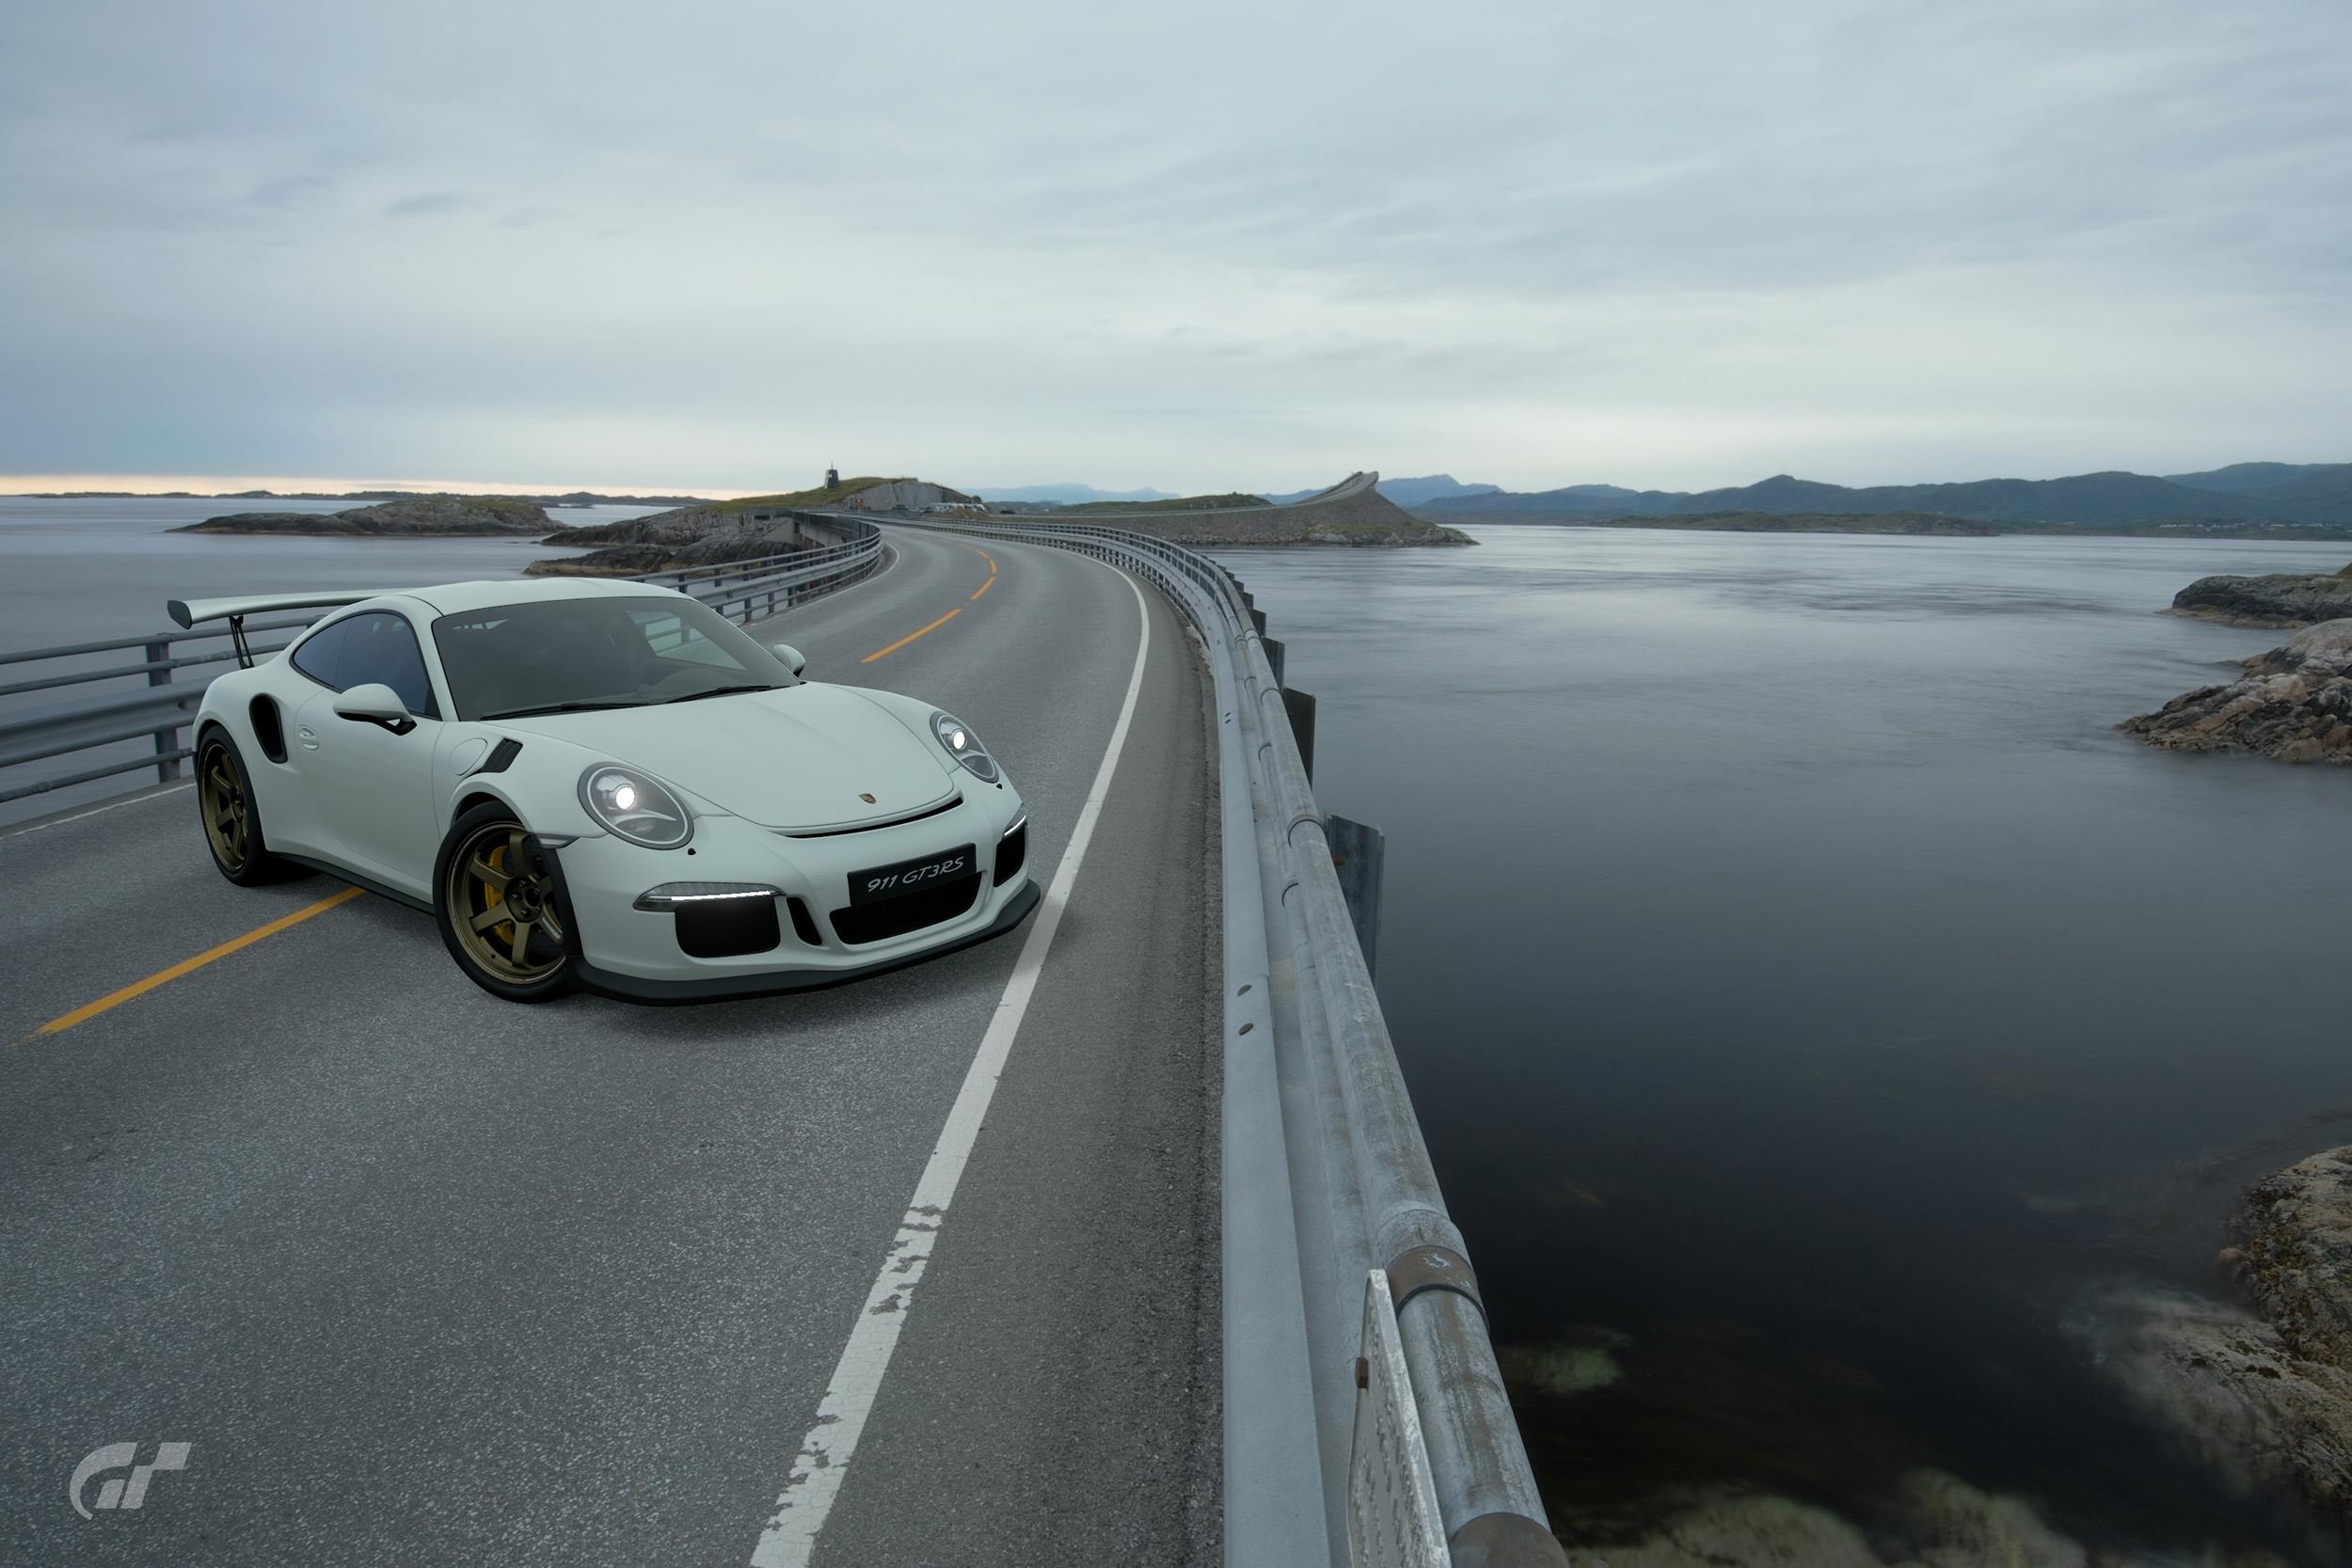 Photo mode in GT Sport is highly triggering to my wanderlust tendencies.